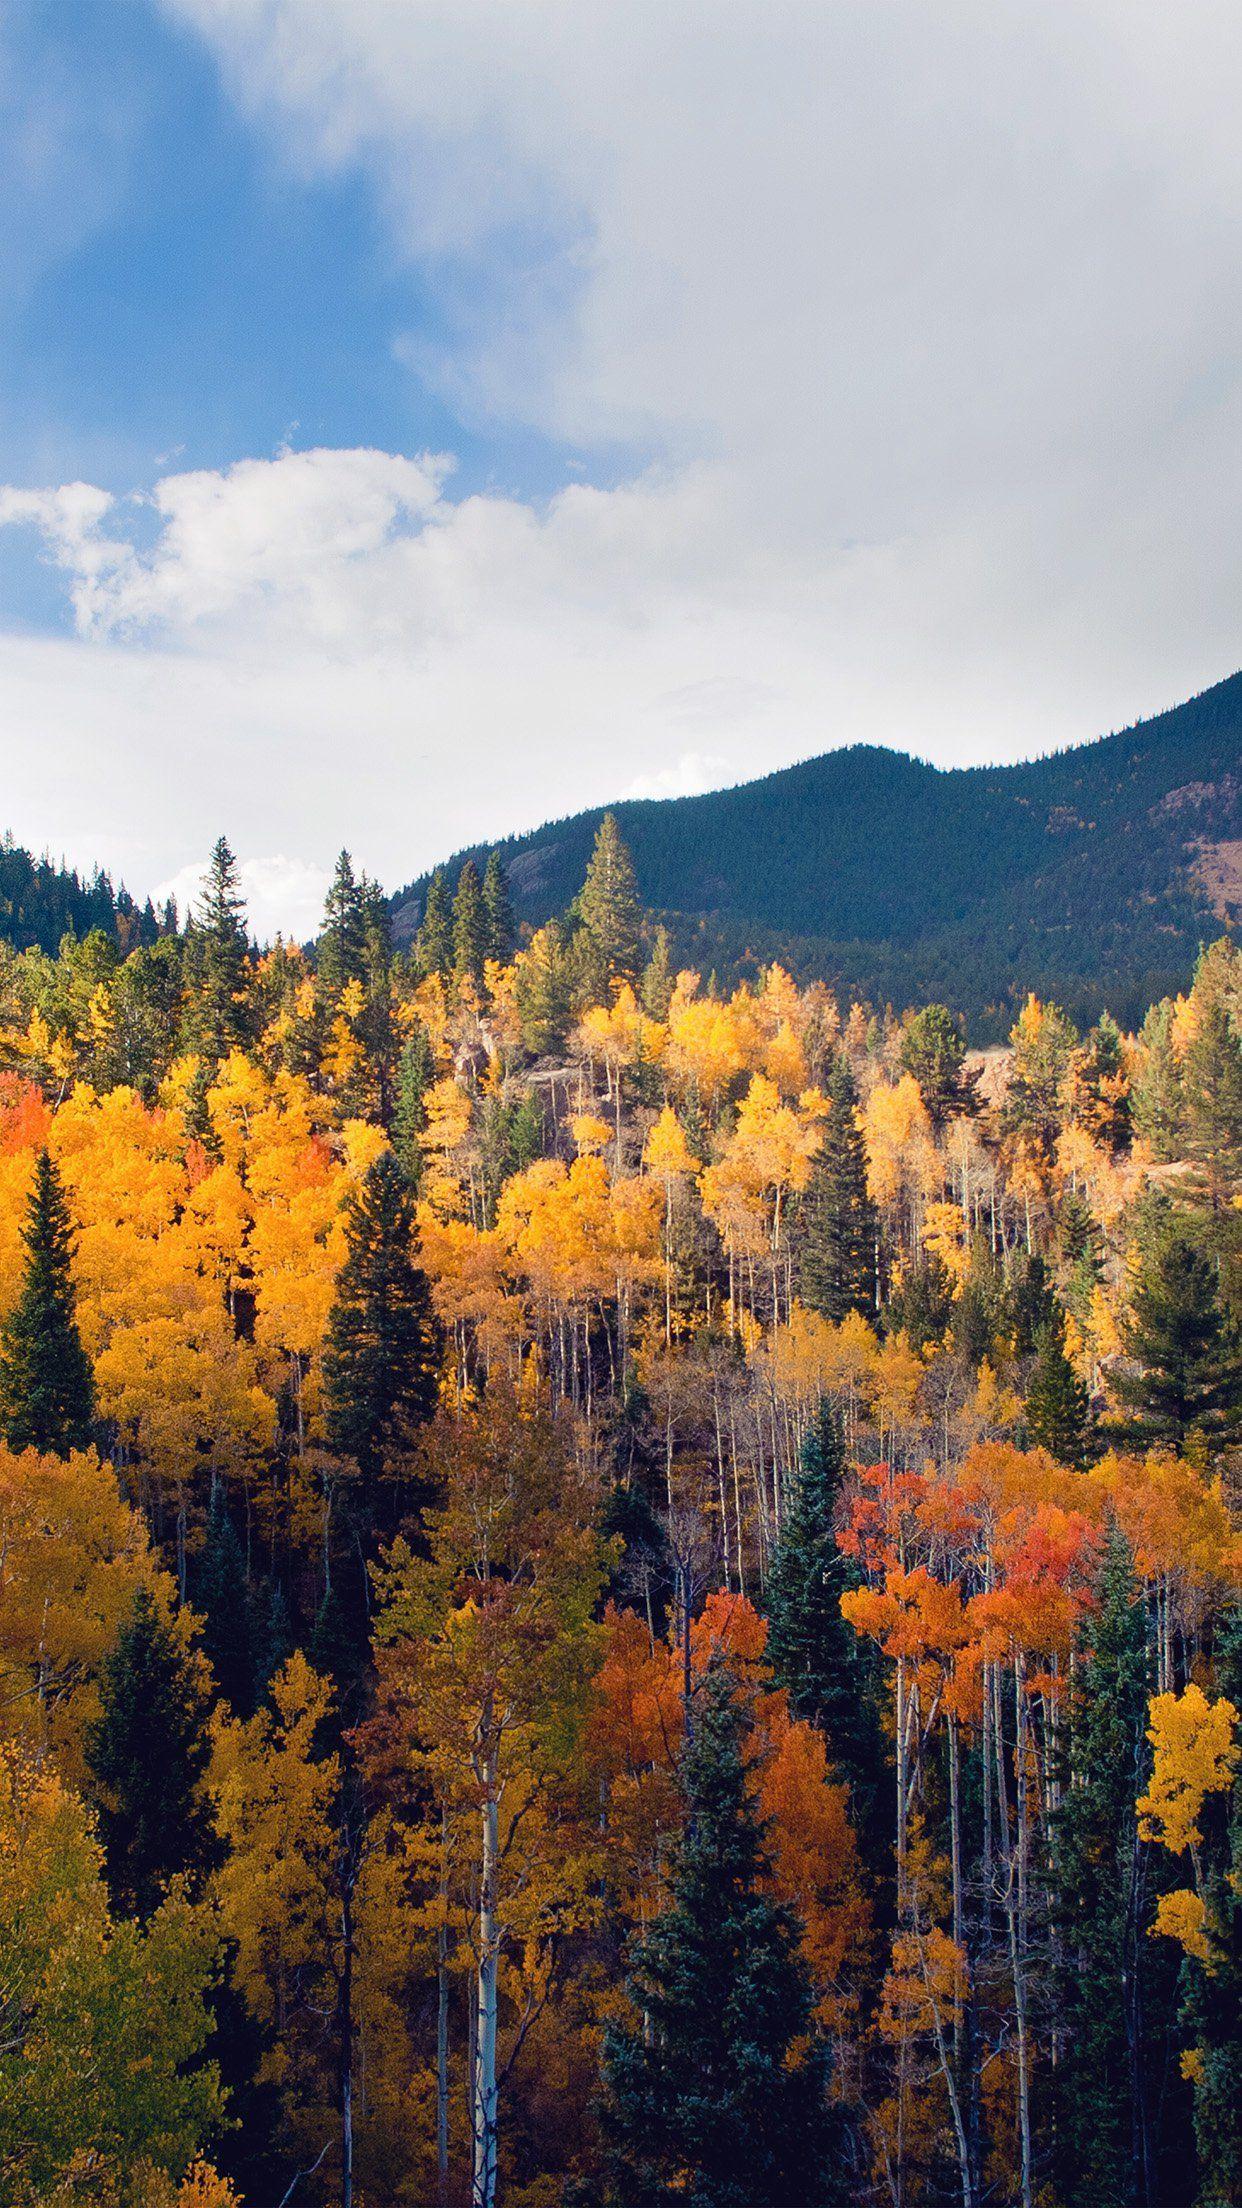 Red Autumn Wallpaper. #autumn #fall #nature #iphone #